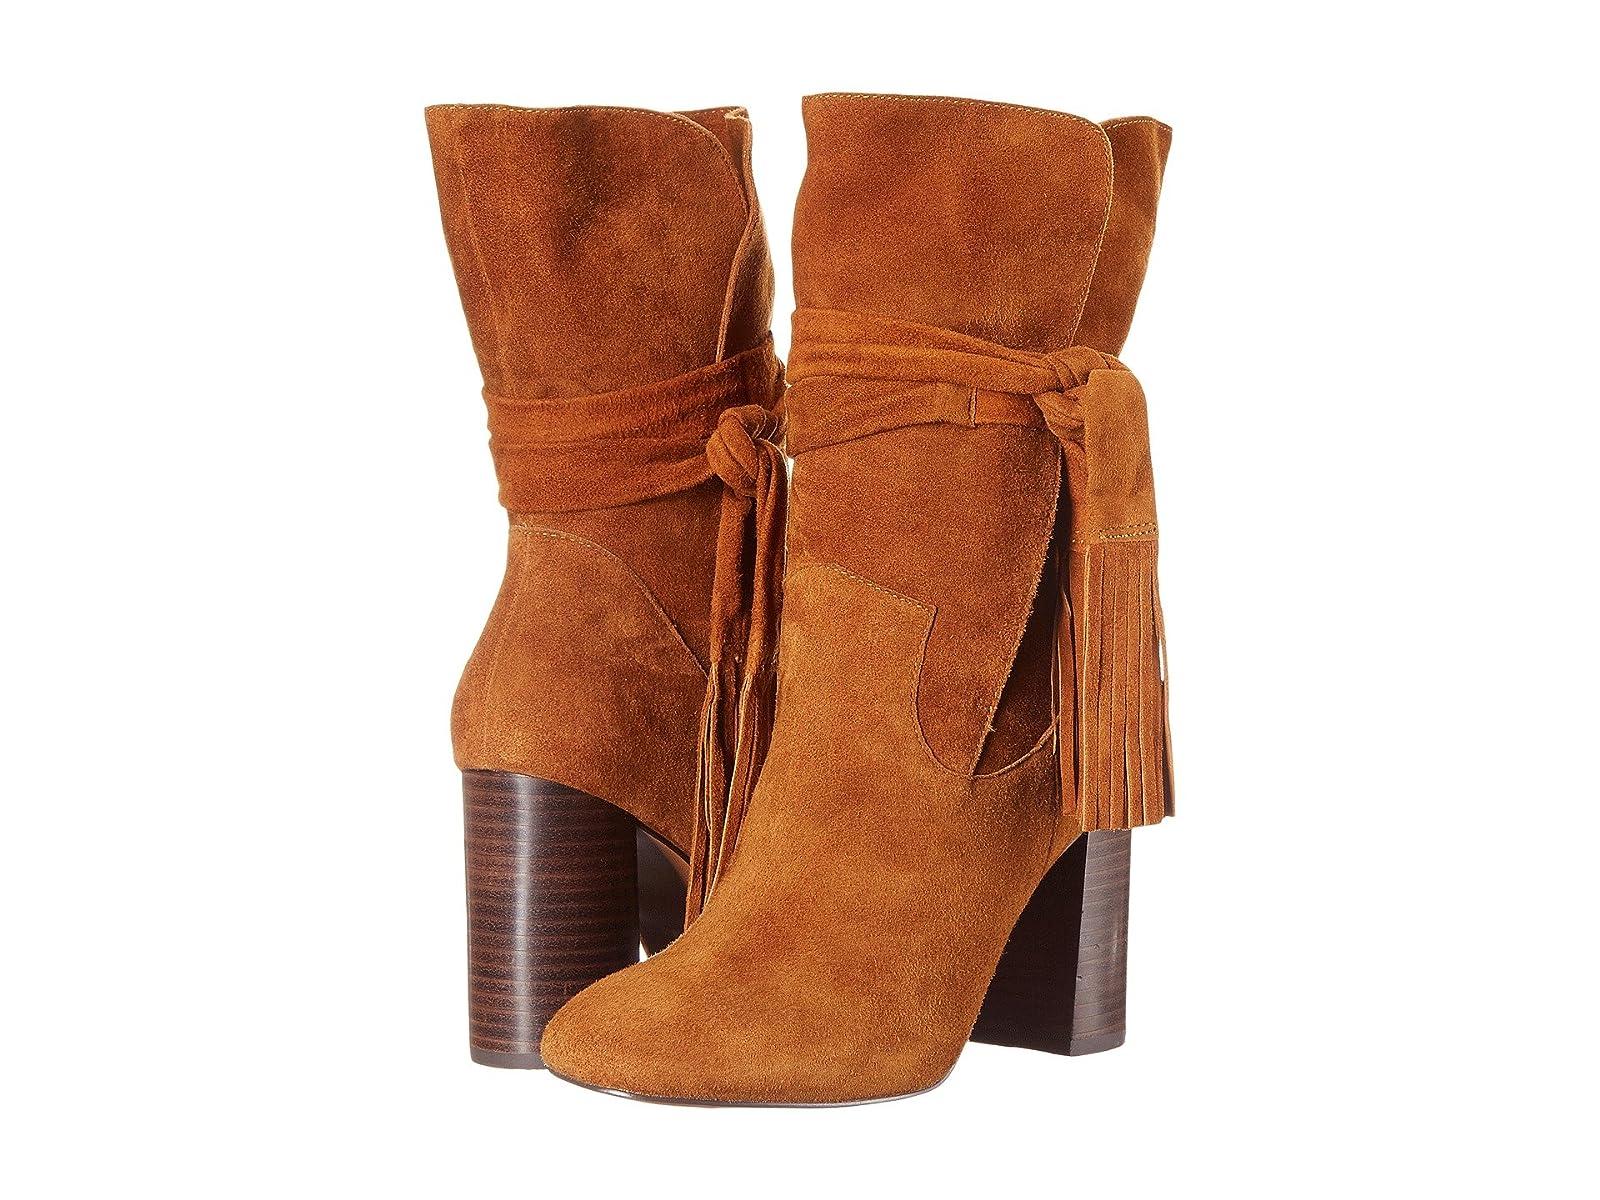 Shellys London LondonCheap and distinctive eye-catching shoes